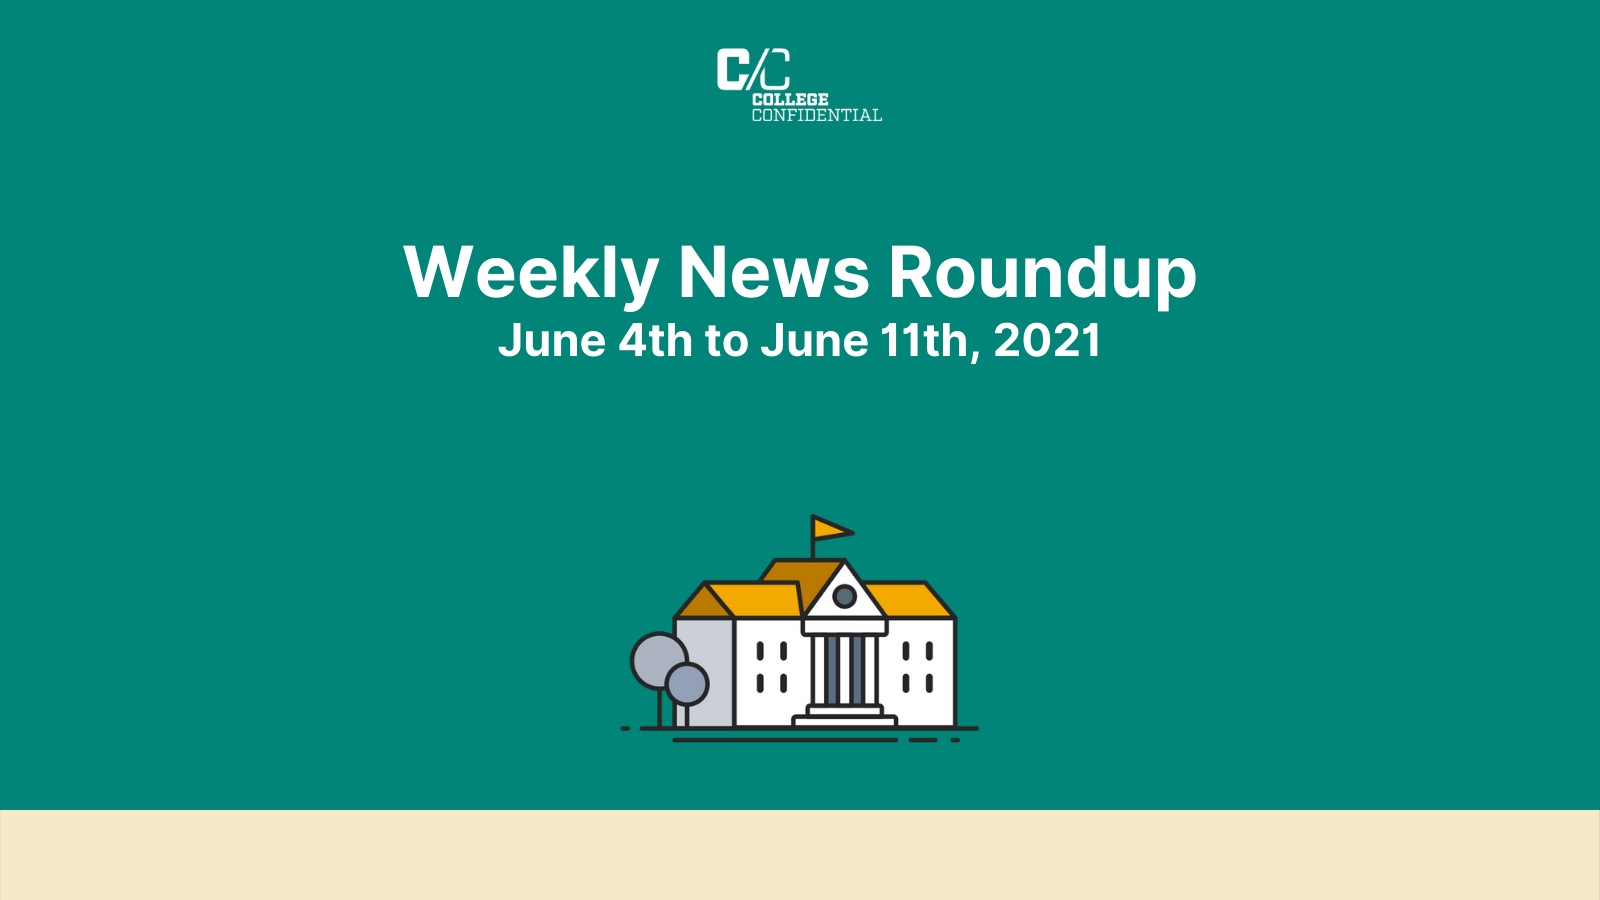 Parent PLUS Loans, Impressive 2021 Grads, and Declining Enrollment: CC Weekly News Roundup